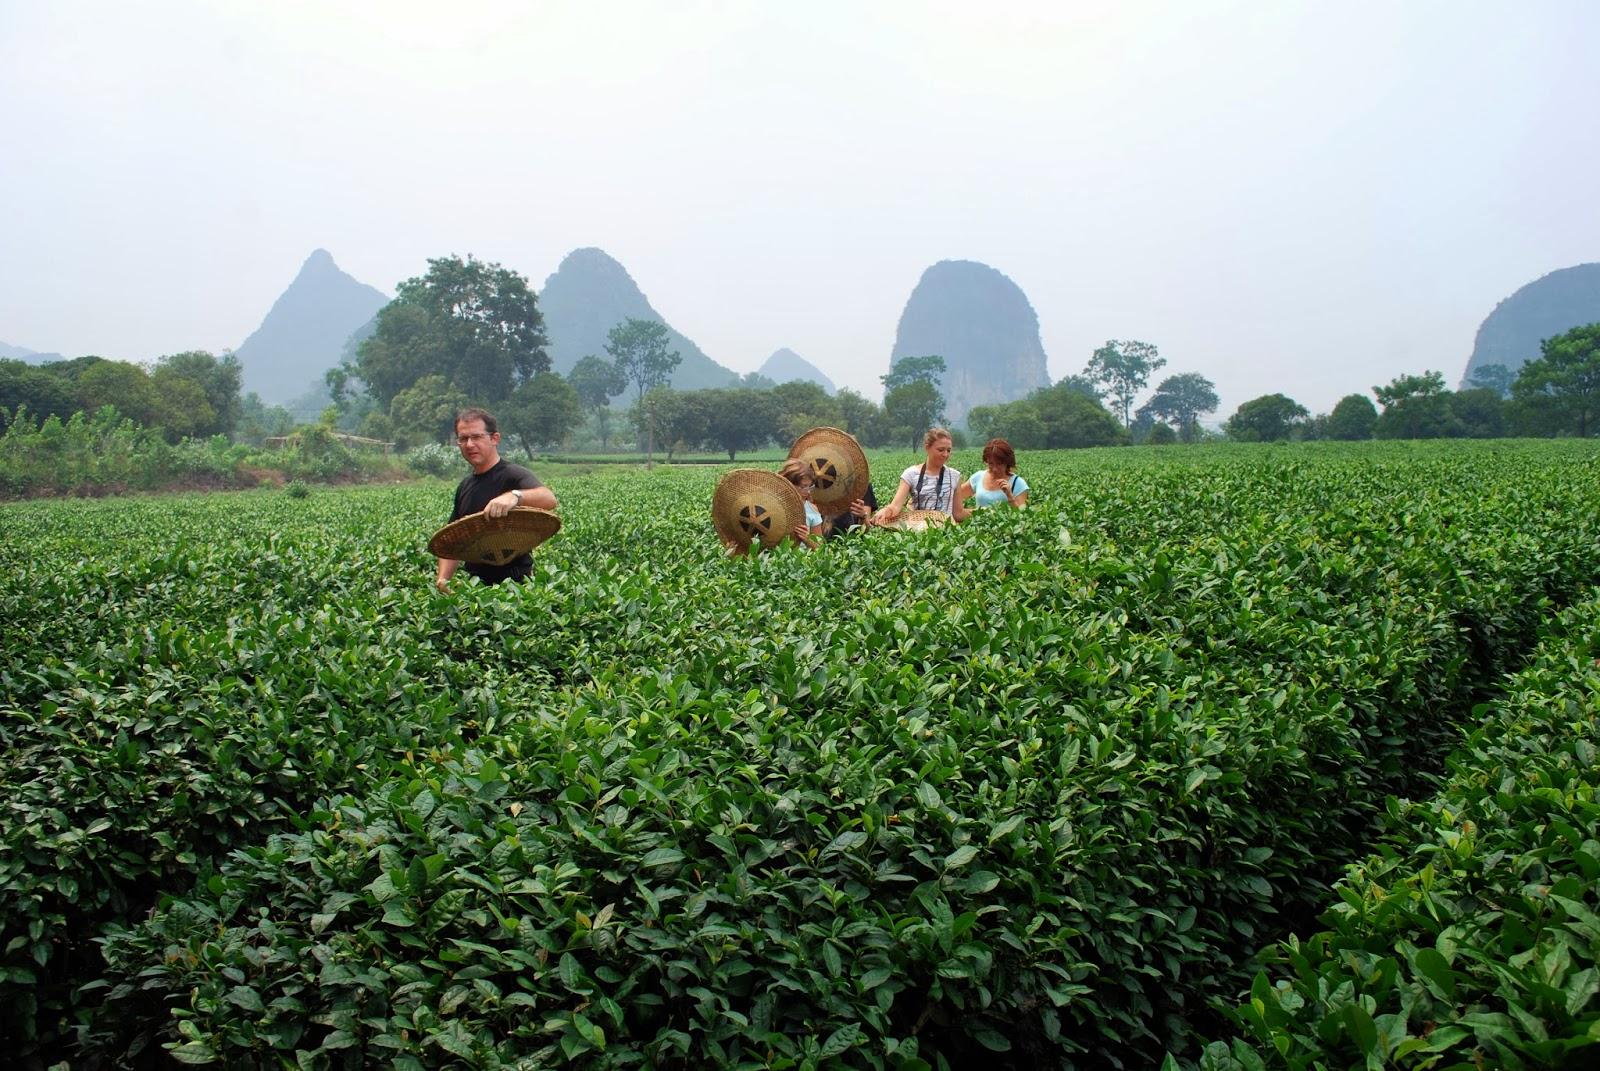 Les Tribulations Des Mornet En Chine  Mardi 20 Ao U00fbt